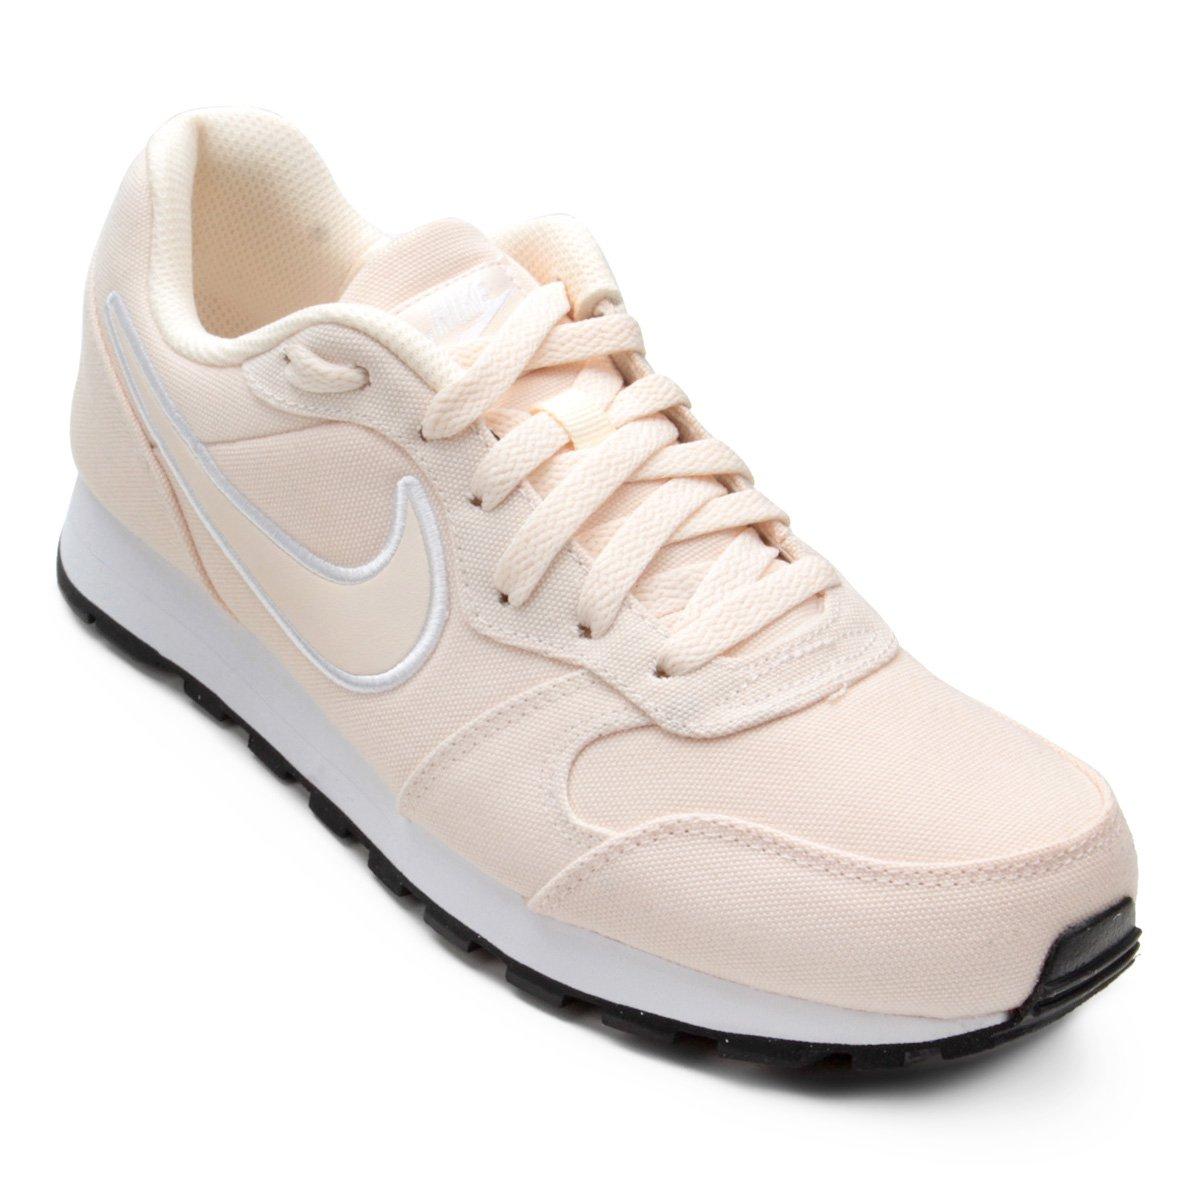 Tênis Nike Md Runner 2 SE Feminino - Nude - Compre Agora  579ee269fc3c3